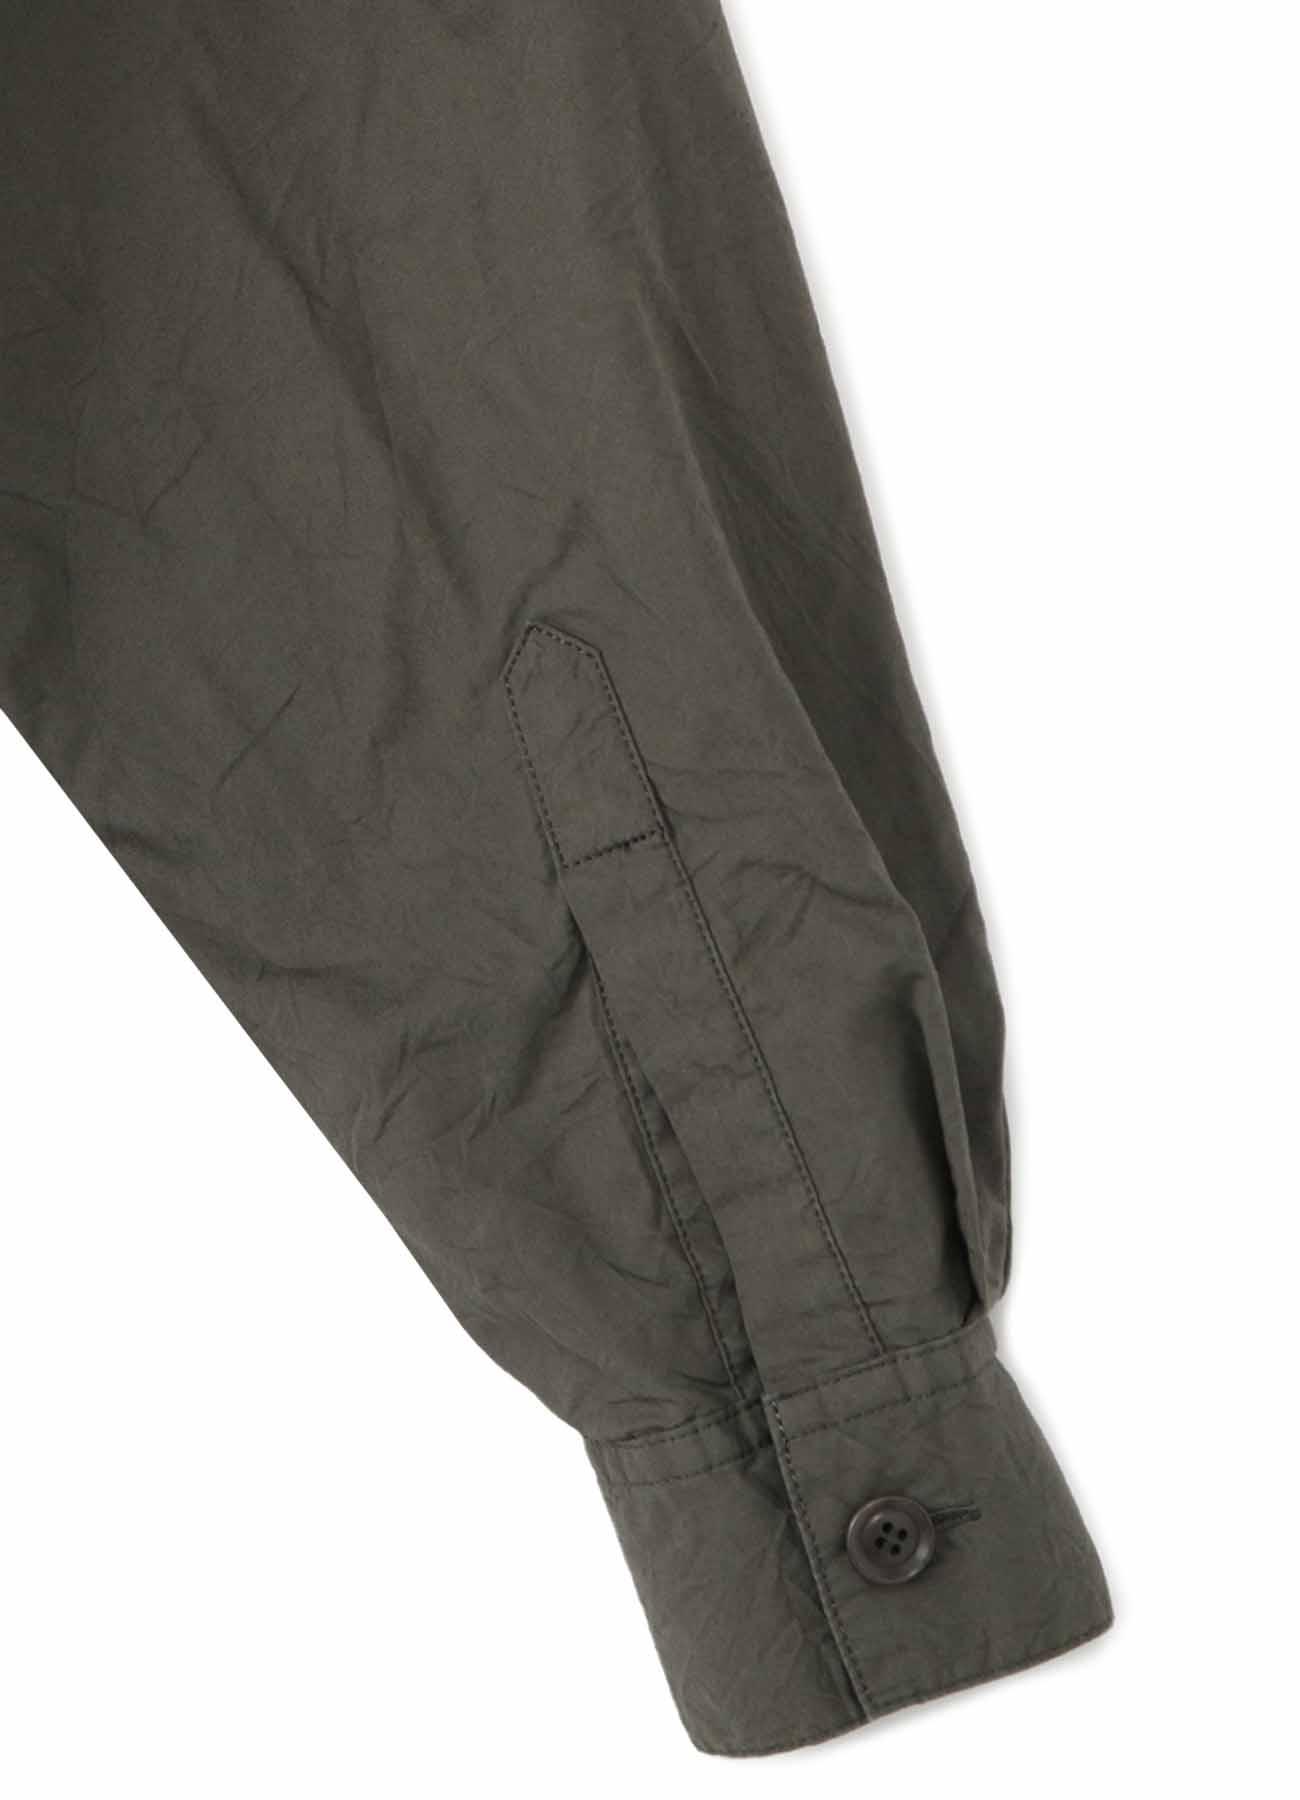 COTTON BROAD WRINKLE GARMENT DYE 2 CHEST POCKET SHIRT DRESS